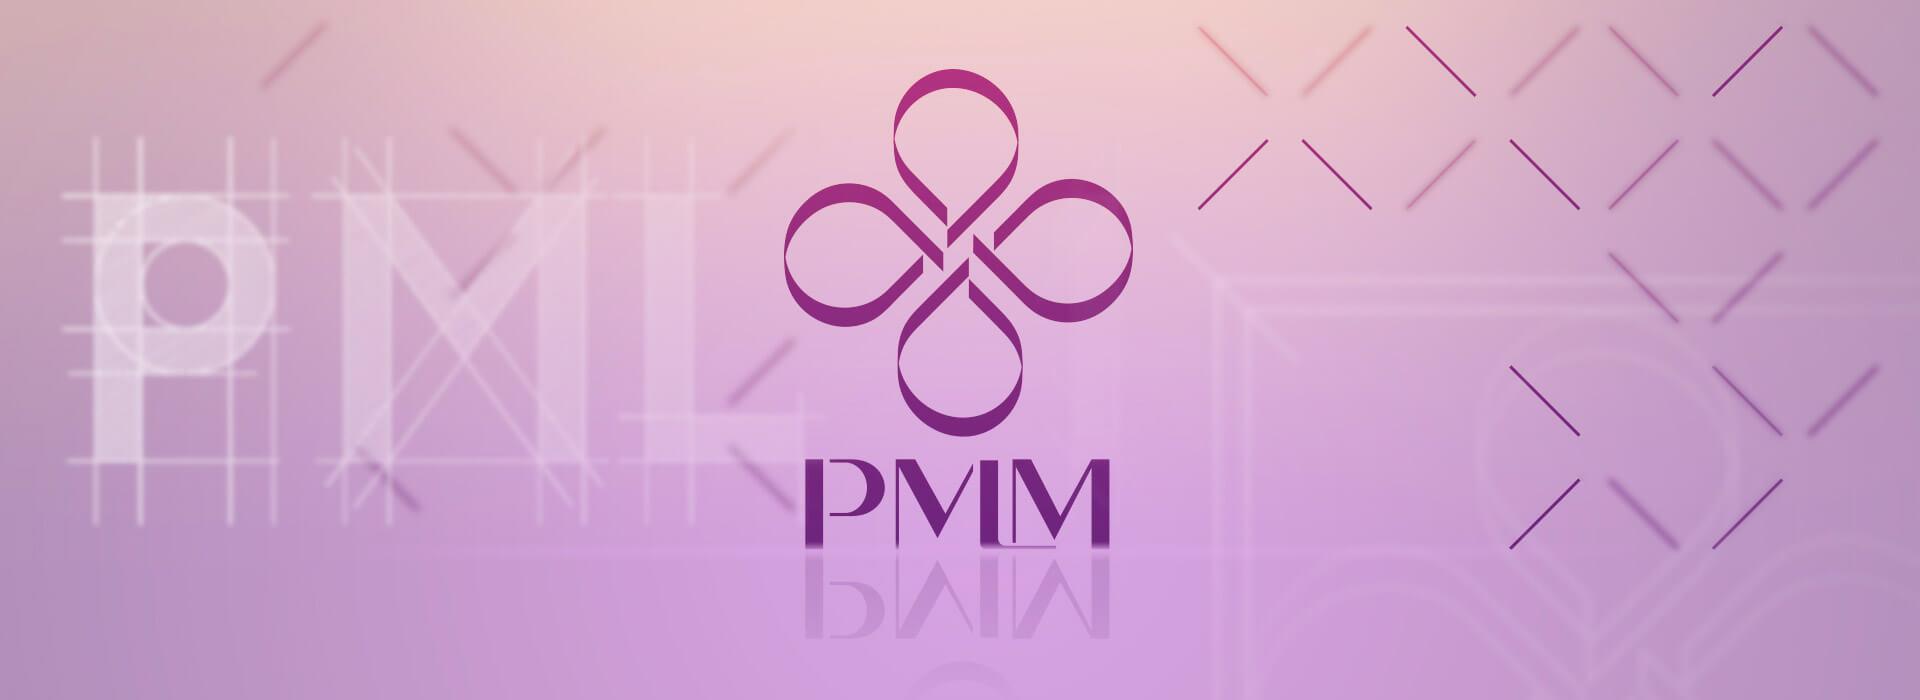 PMLM rebranding